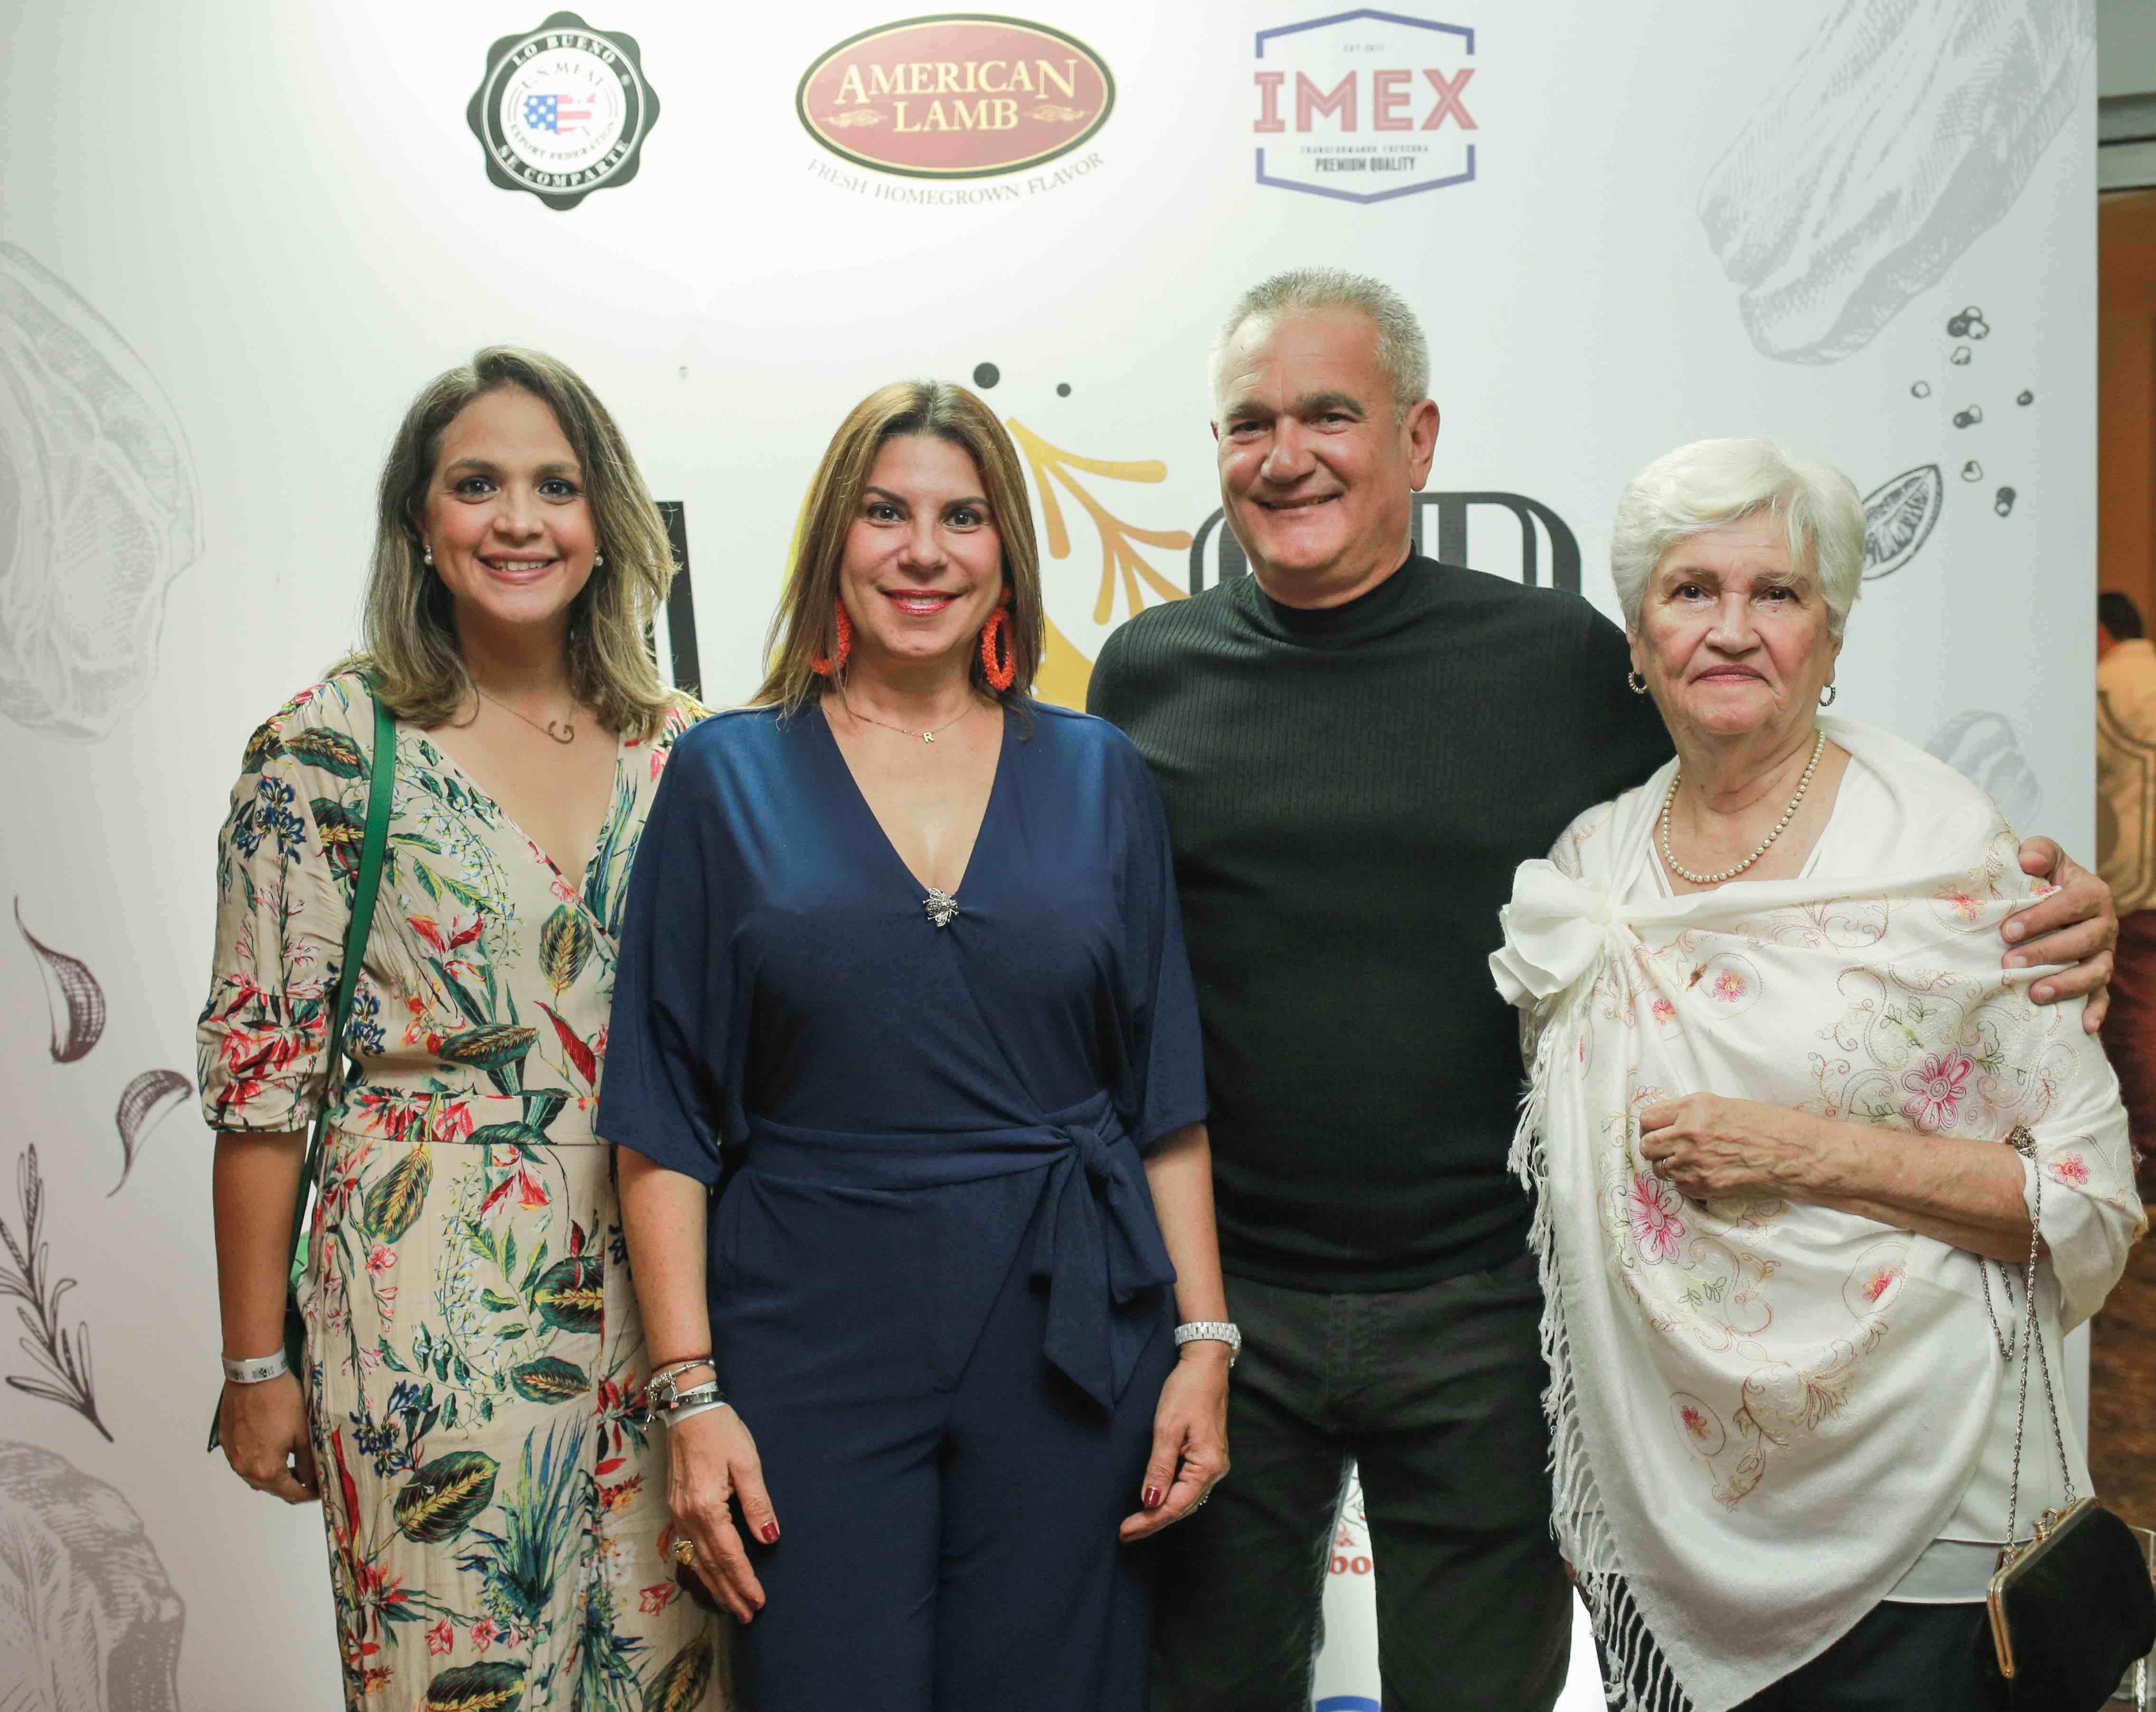 5. Grace Garrido, Rosin Valdez, Frank Valdez & Madga Pellerano